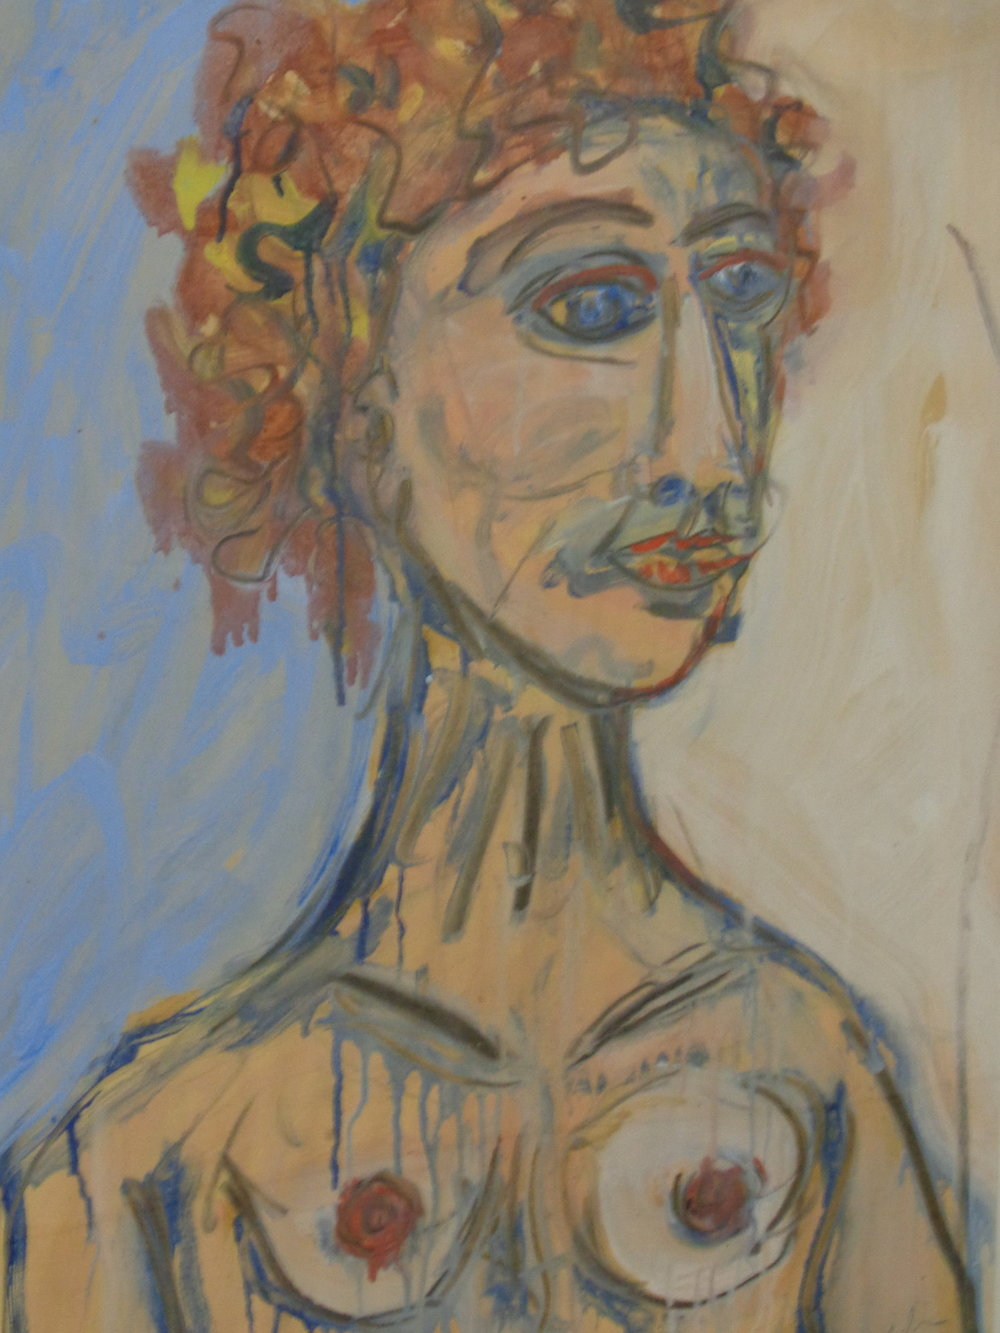 Irina - Oil on paper 2014